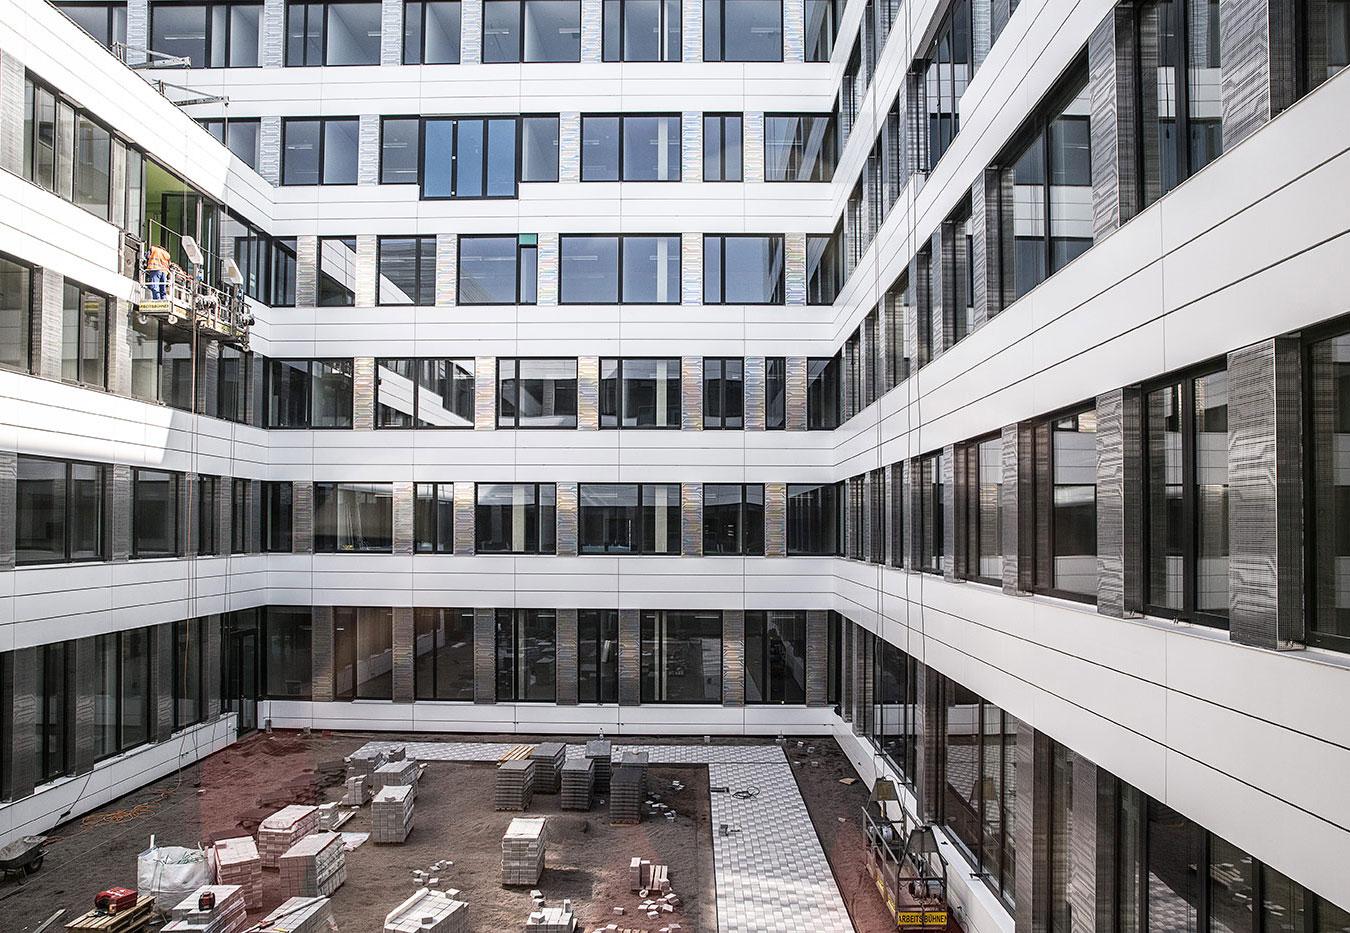 bildergalerie - Fh Dsseldorf Bewerbung